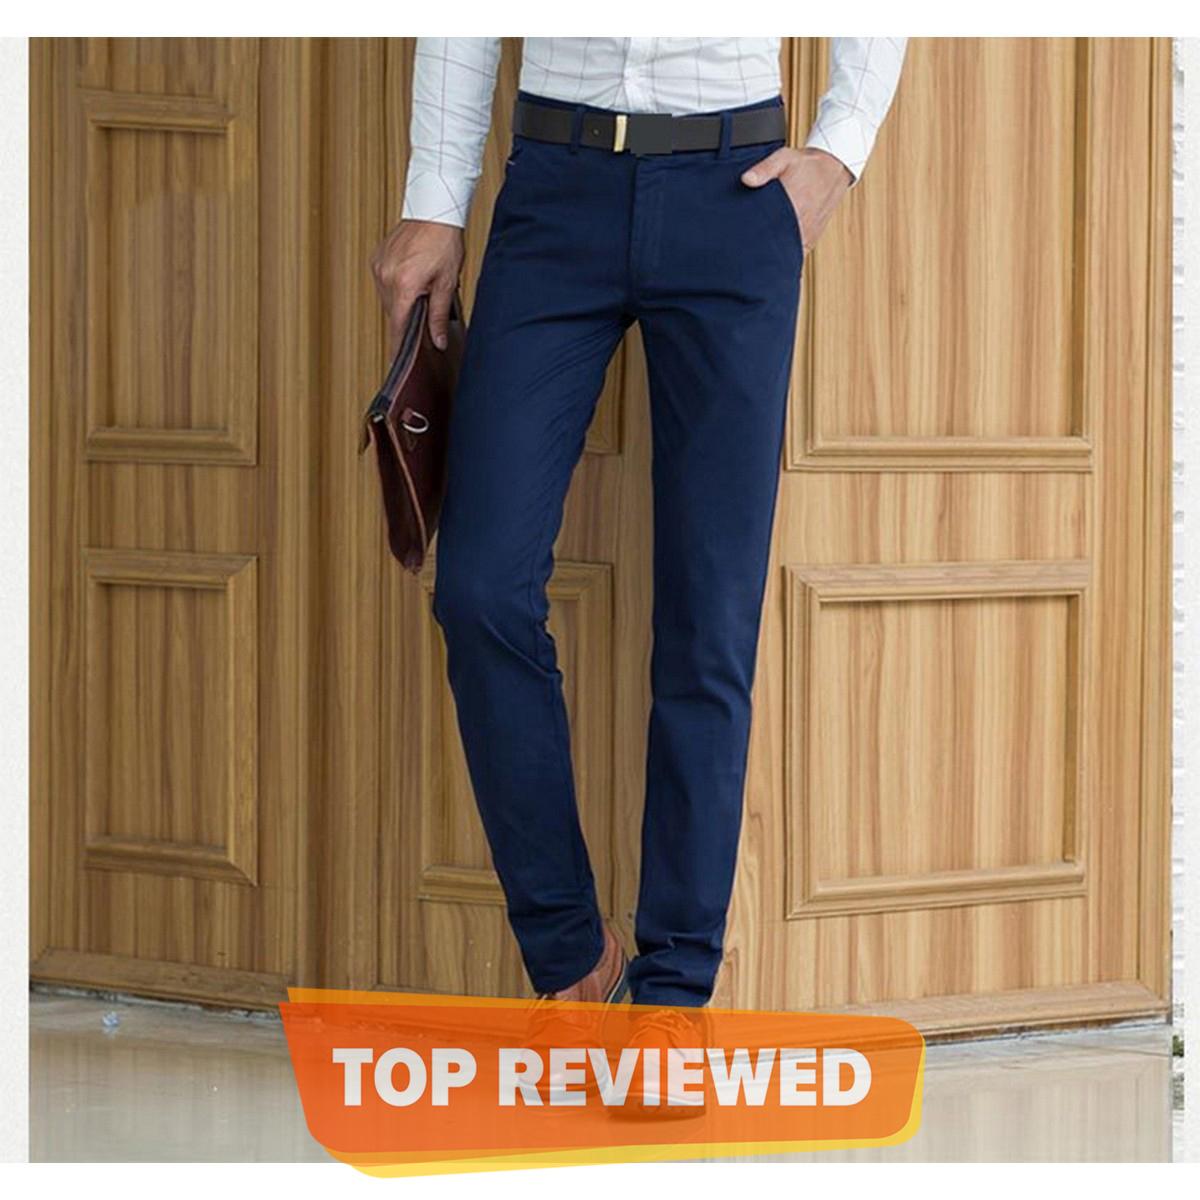 Pants For Man And Boys High Quality Blue Colour Cotton Jeans Pant 2021